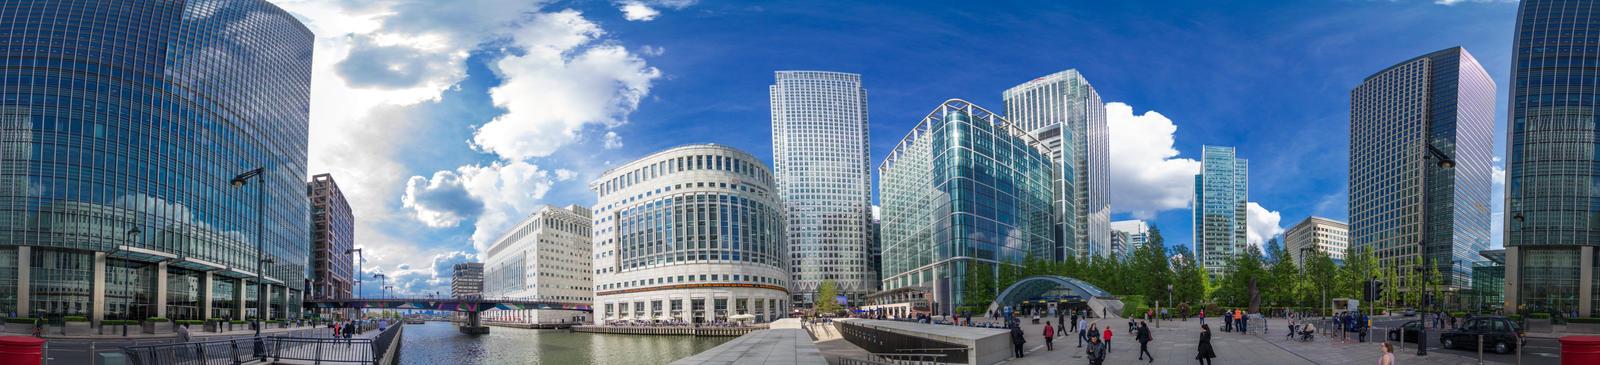 Canary Wharf 360 Panorama by PixelPandaa